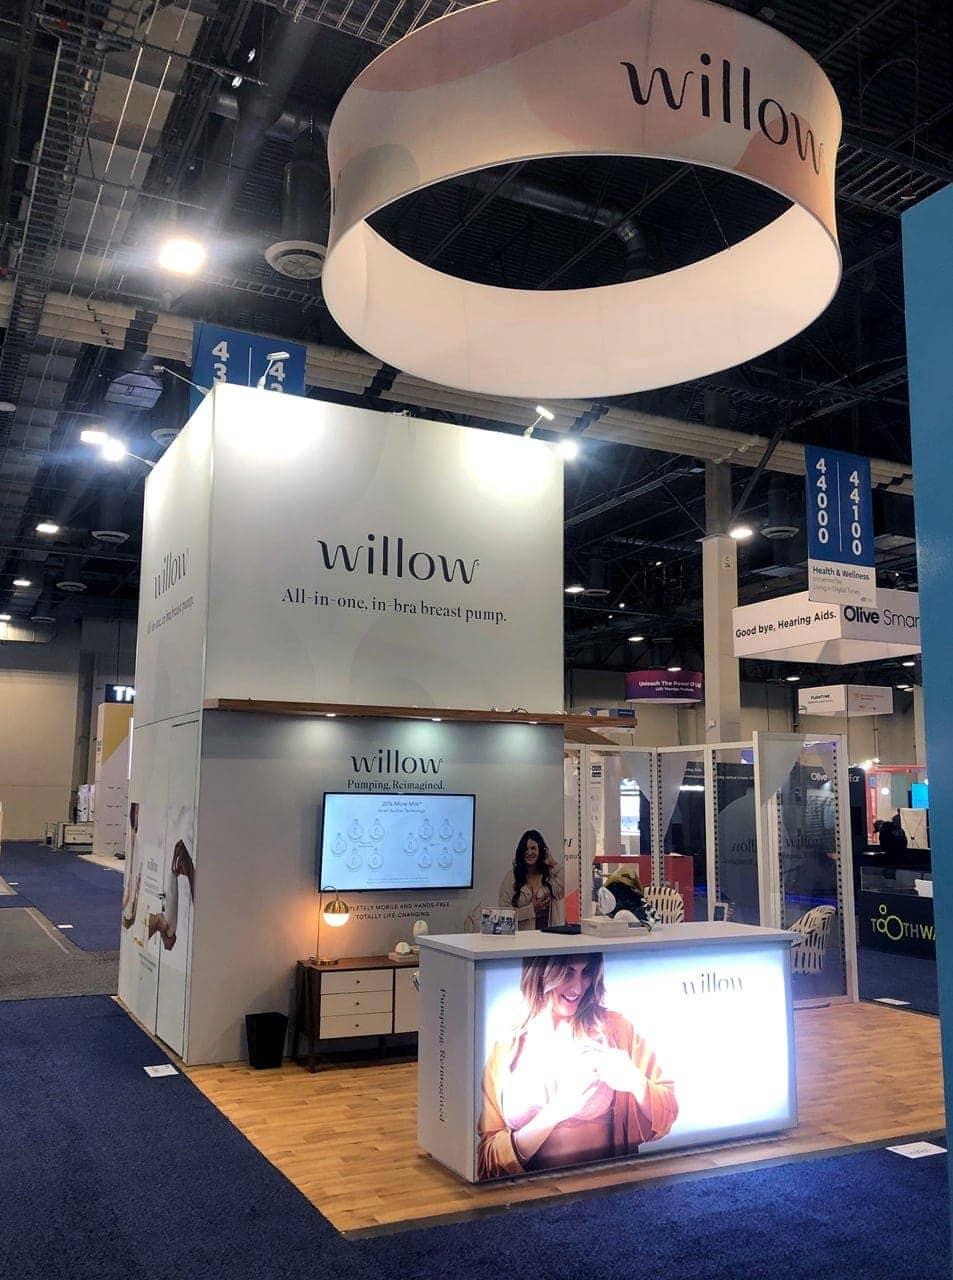 Willow-1342E4DC-E729-4A7F-8AFA-0CD3FF6D45CE